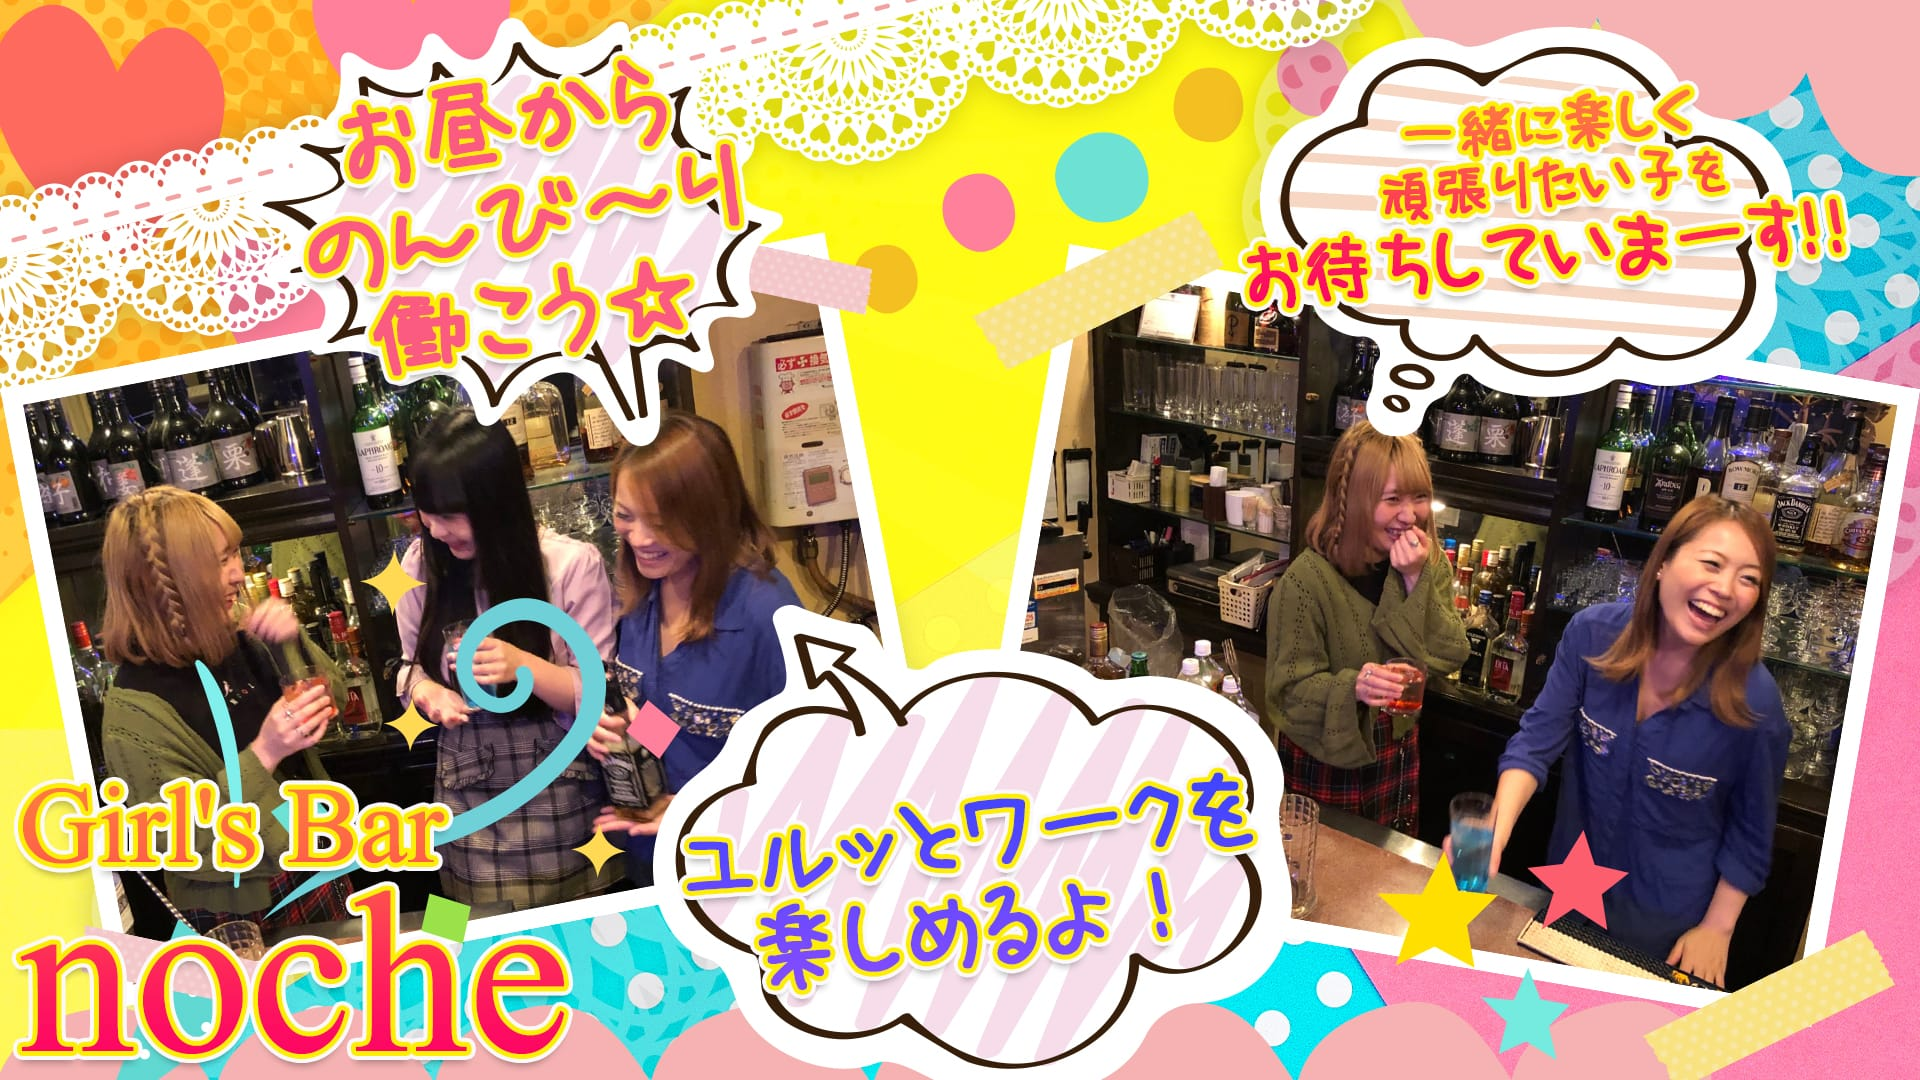 Girl's Bar noche(ノーチェ) 池袋ガールズバー TOP画像